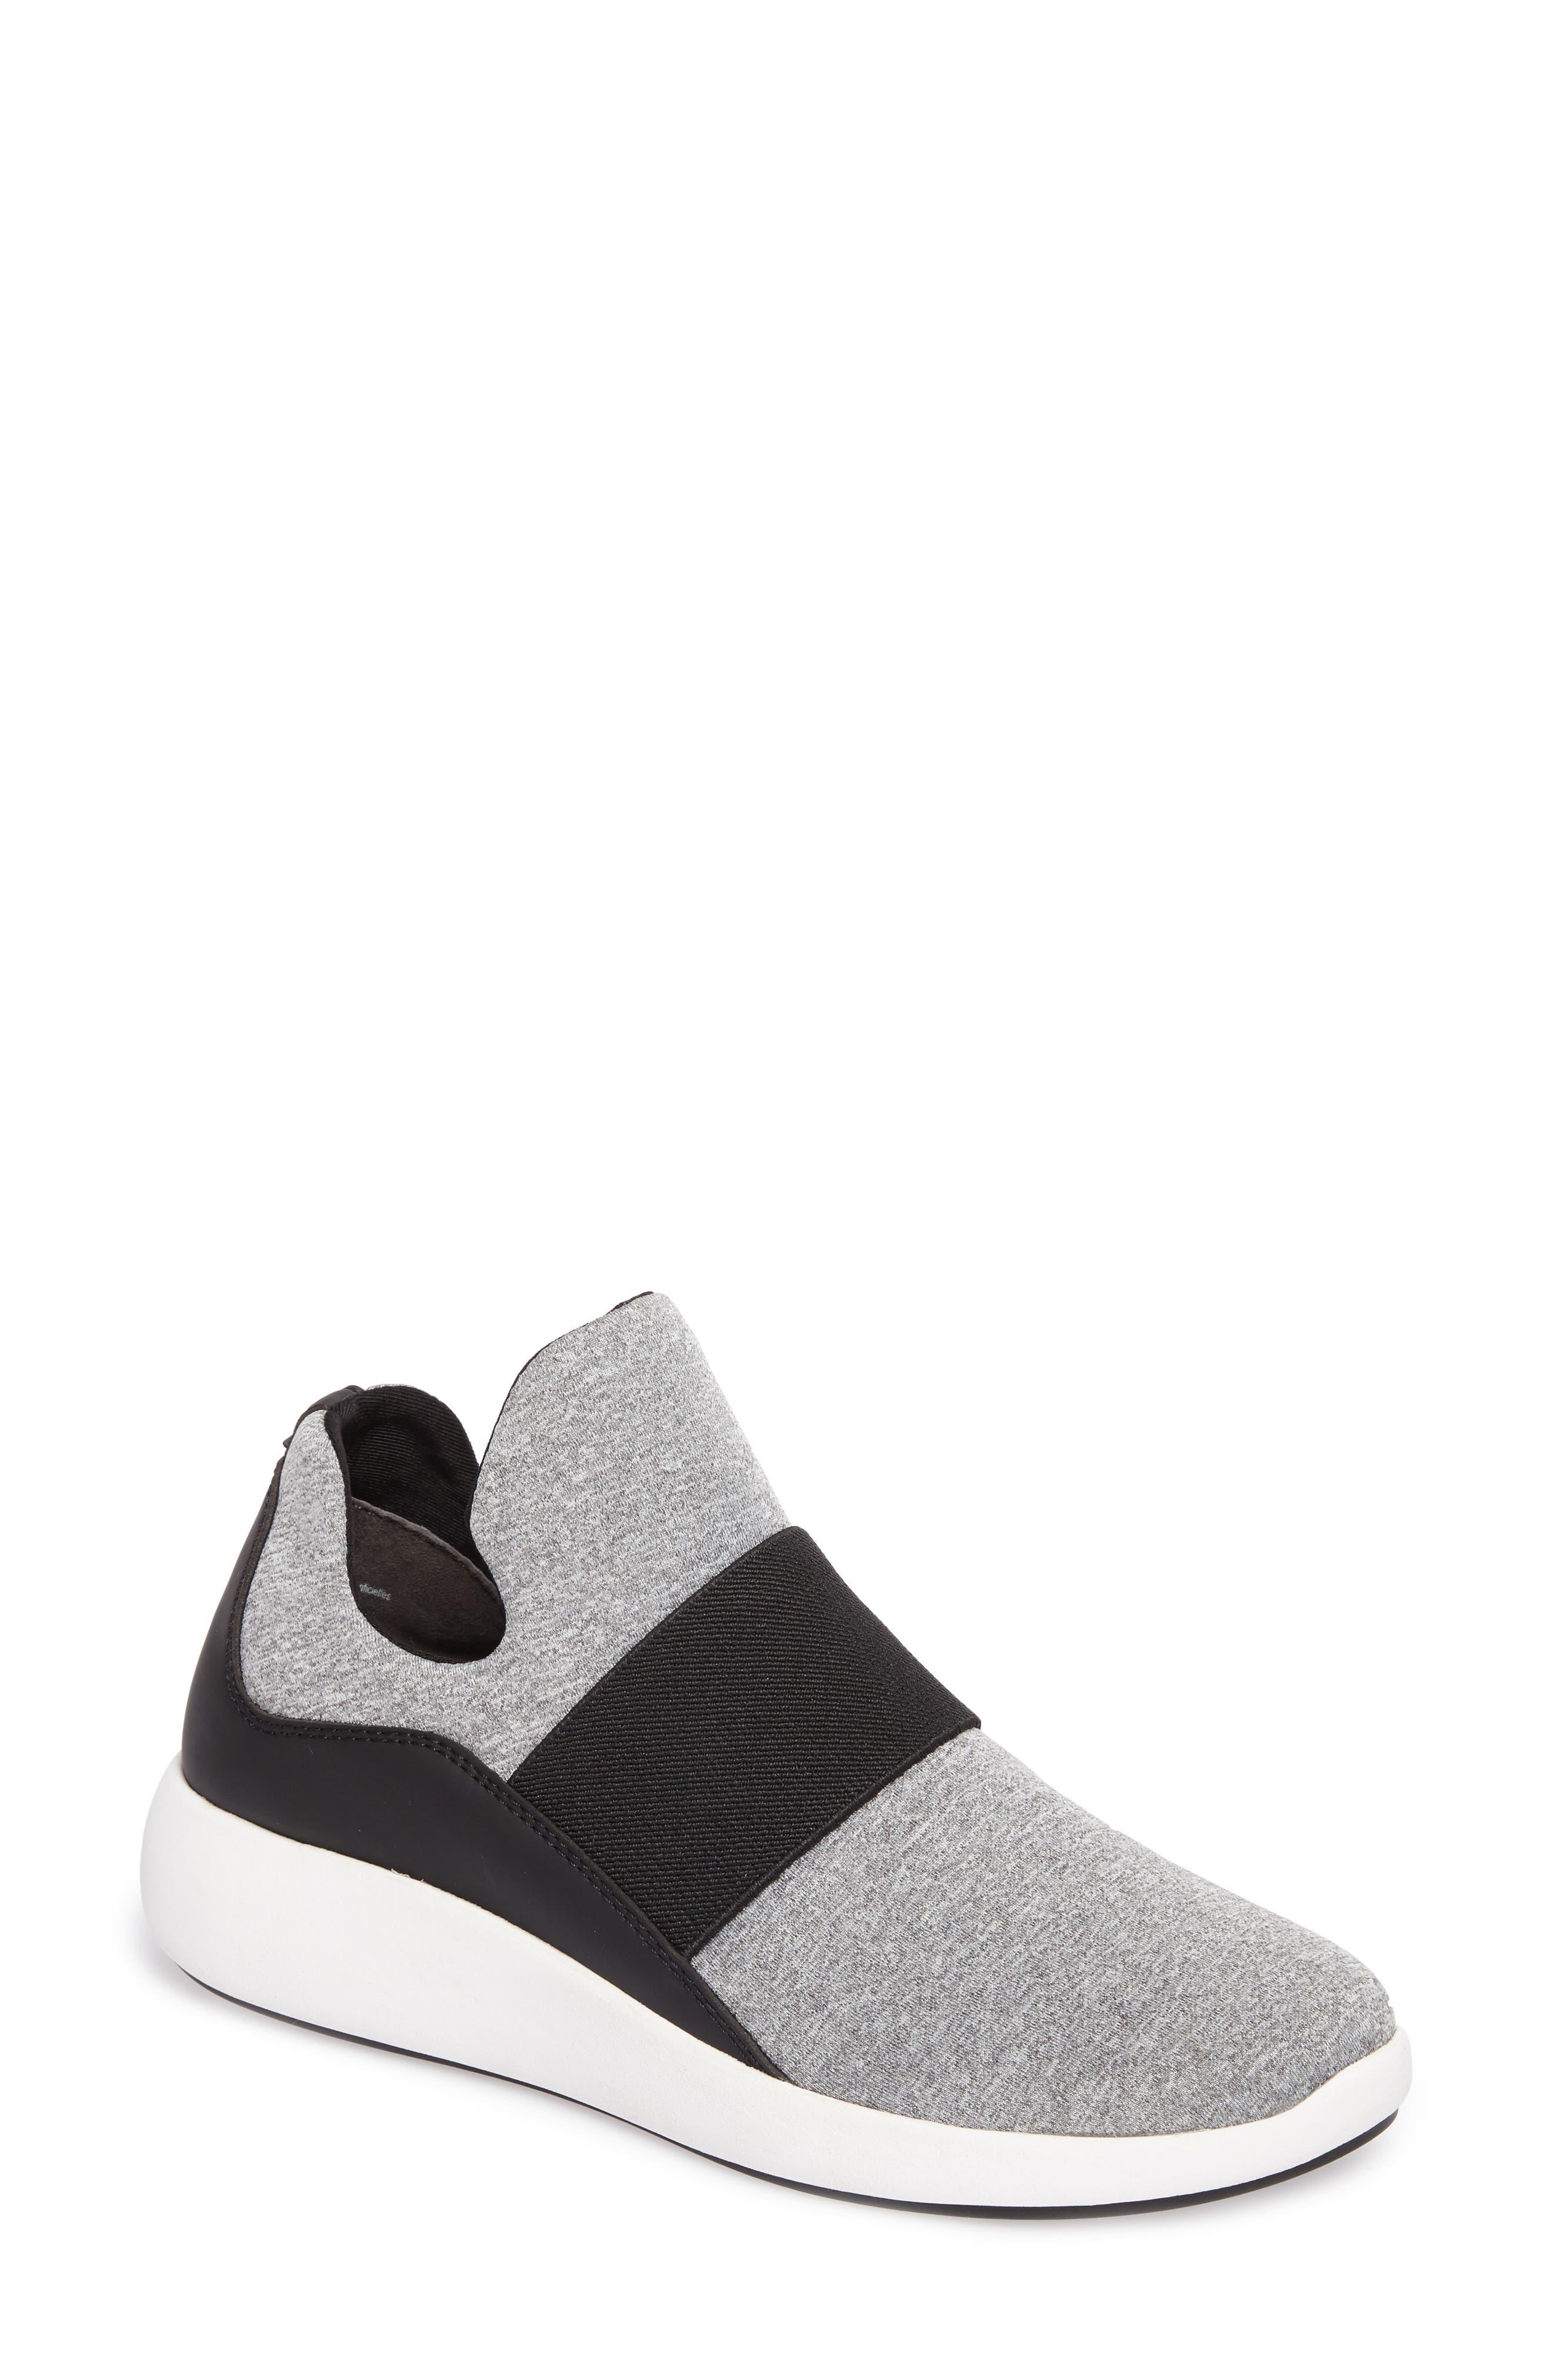 Donna Karan Cory Slip-On Sneaker,                         Main,                         color, Light Pearl/ Black